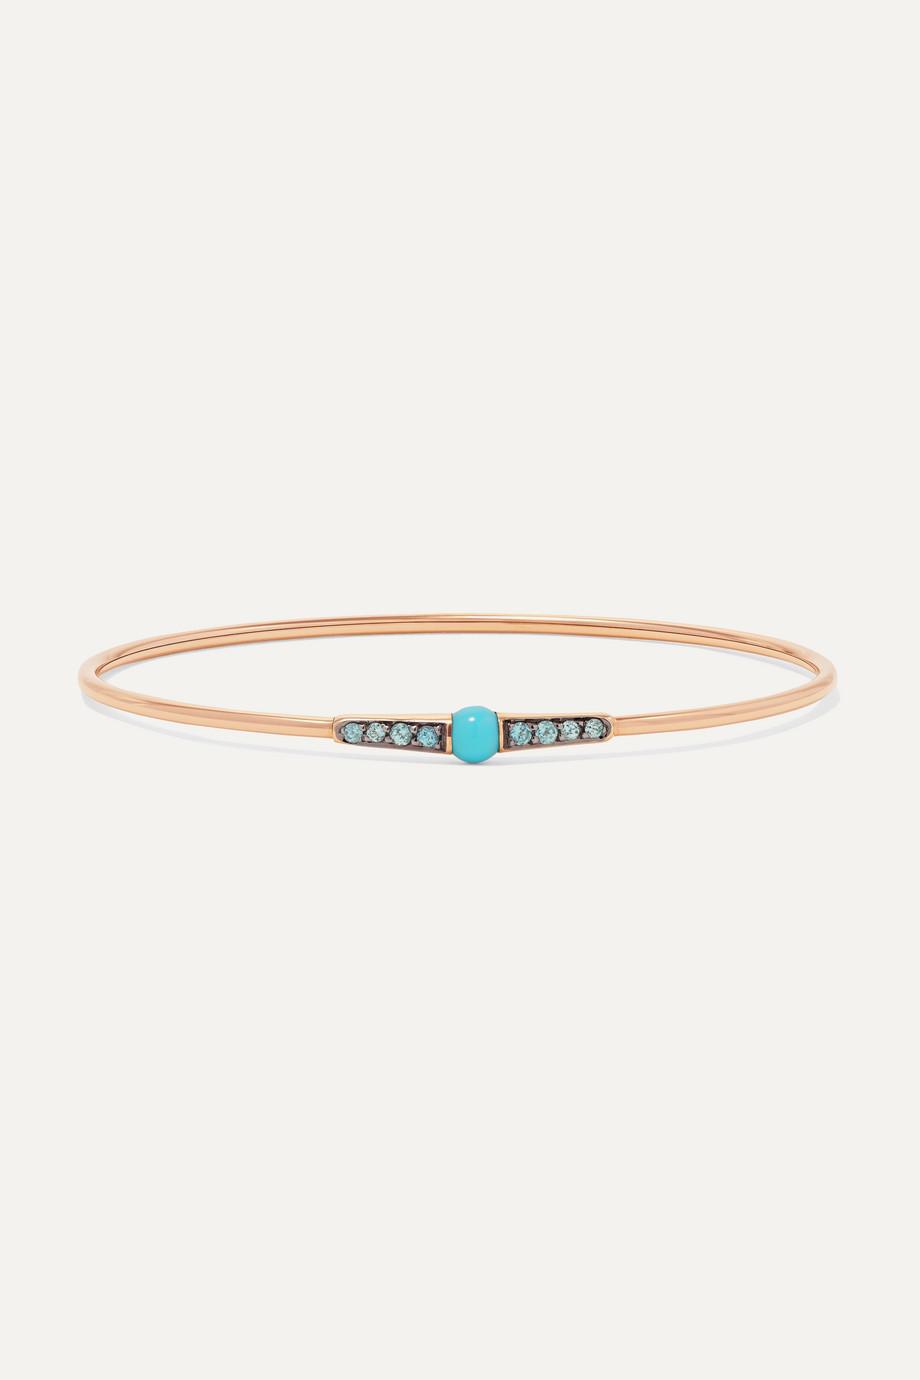 Pomellato M'ama non M'ama 18-karat rose gold, lapis lazuli and zircon bracelet